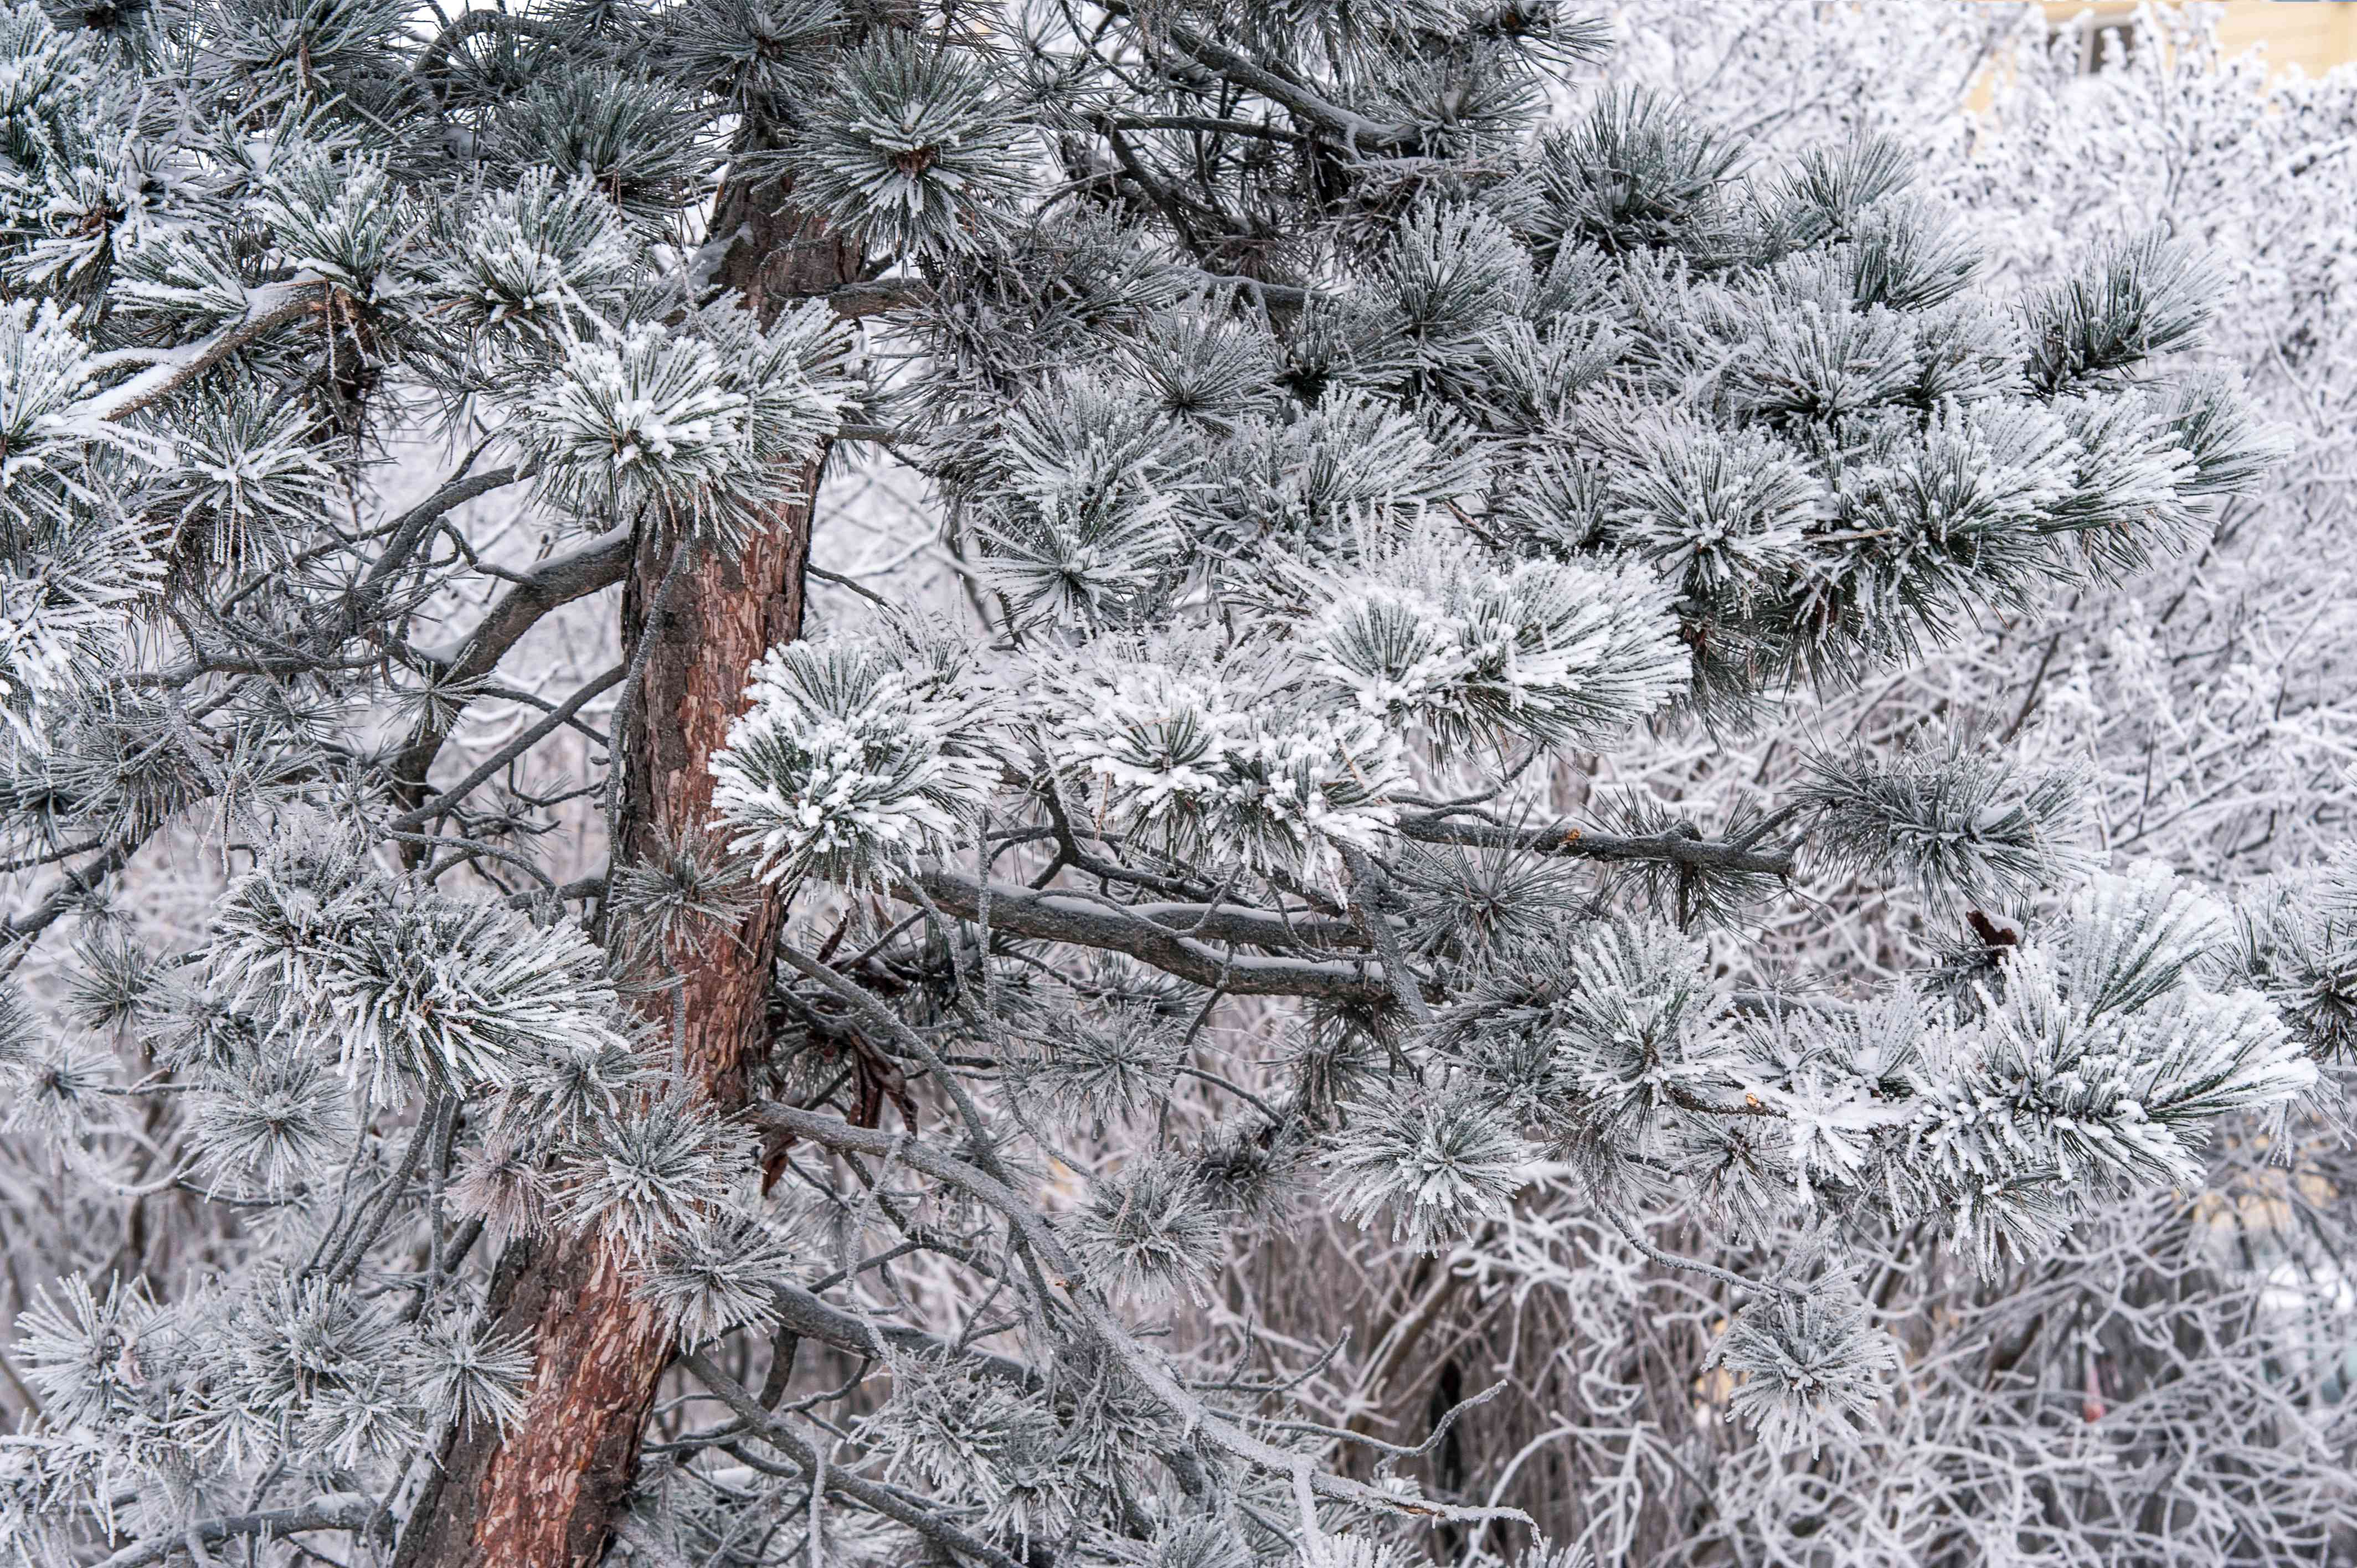 Scots pine in winter